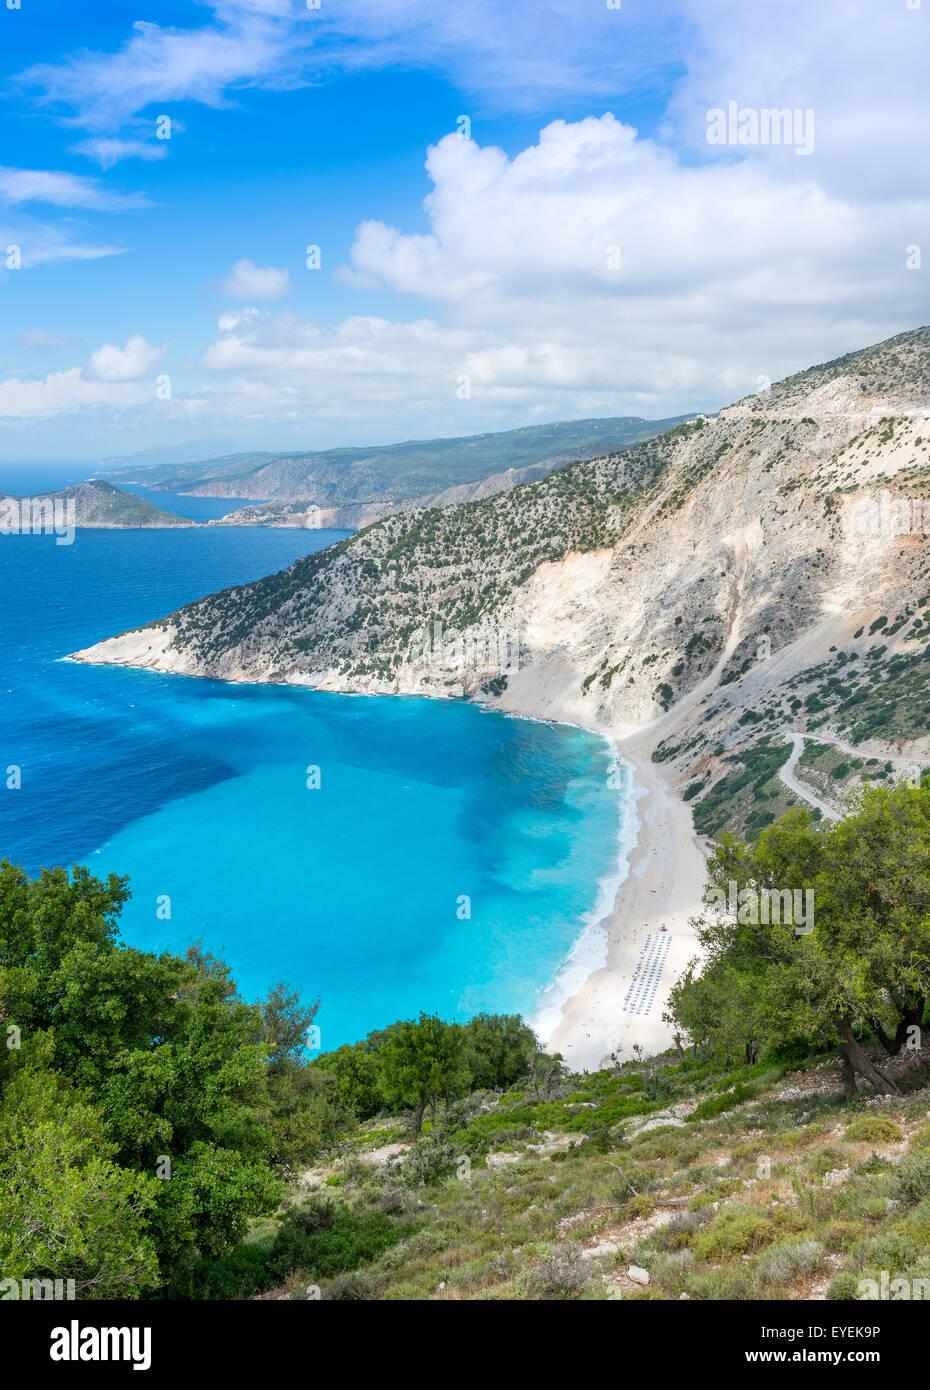 Myrtos Beach, Kefalonia Island, Ionian Sea, Greece Stock Photo